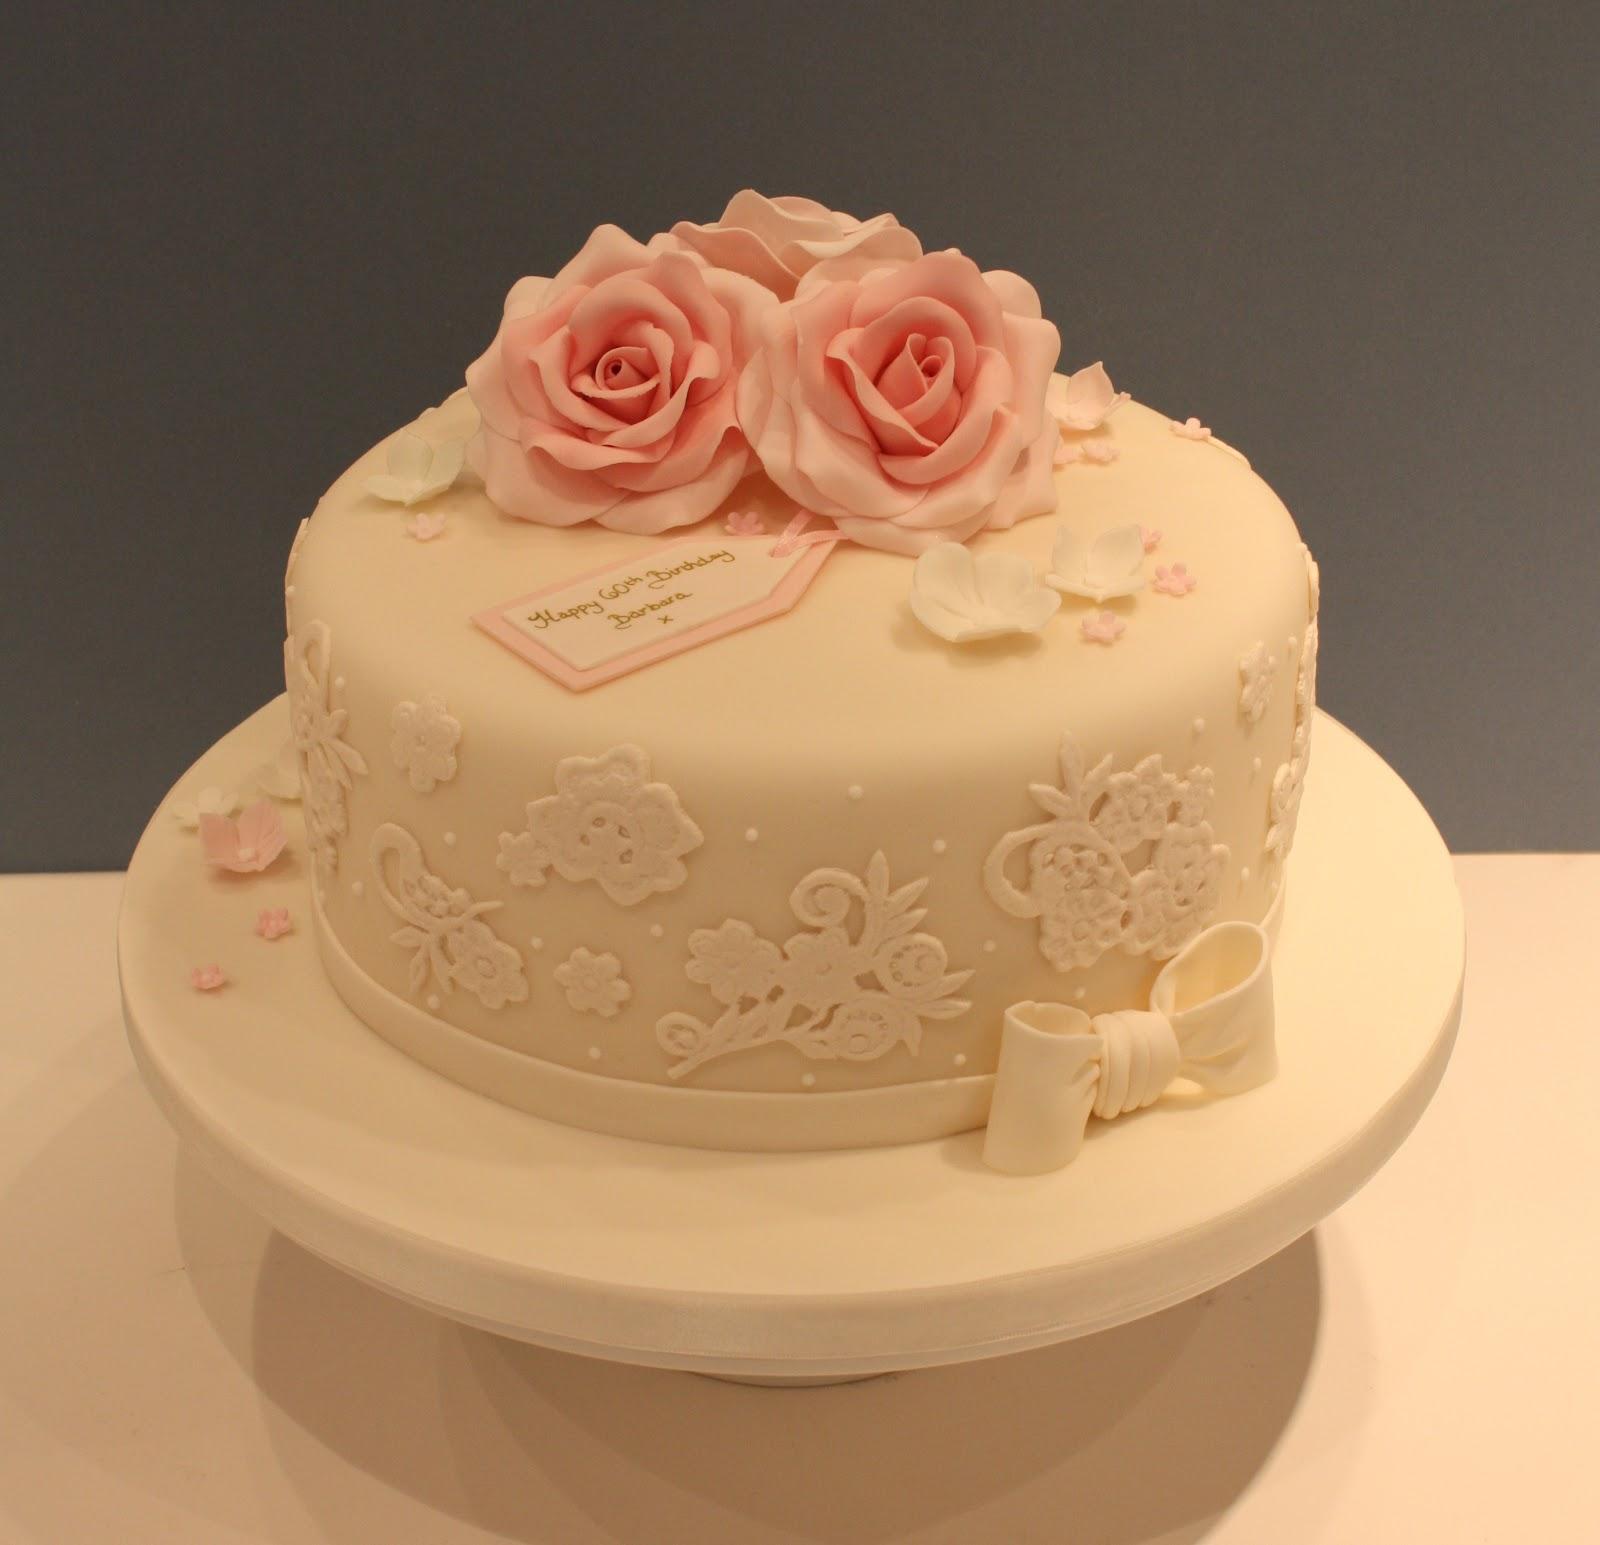 500 Simple Elegant Cakes Ideas Wedding Cakes Cake